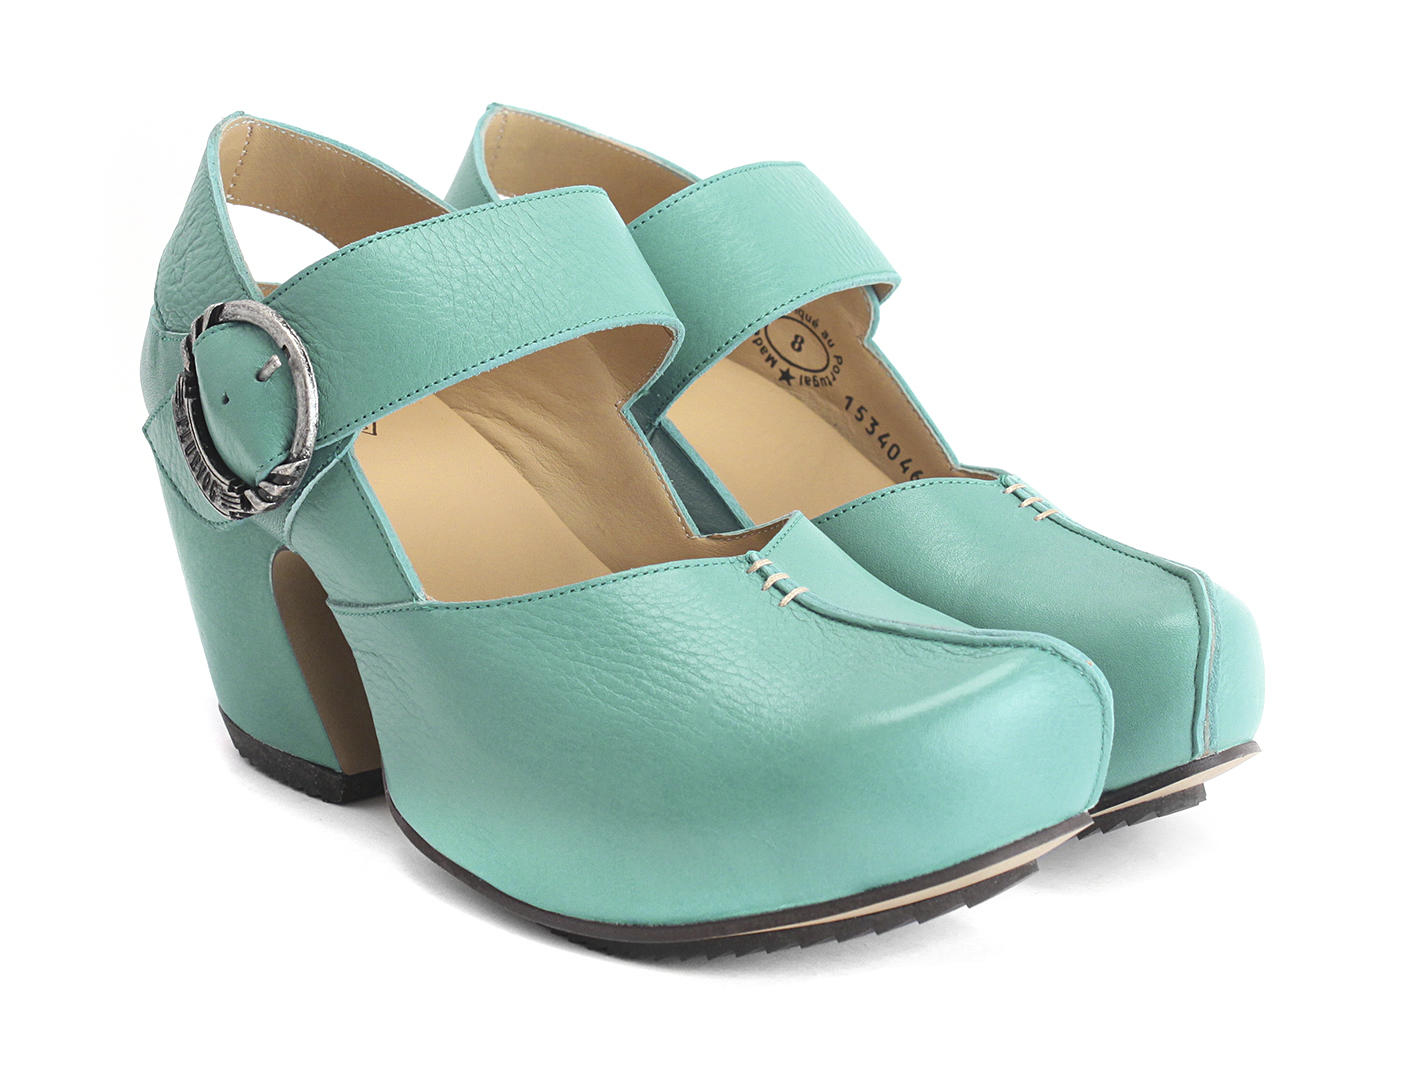 Fluevog Shoes  Shop  Guide Turquoise  Platform Mary